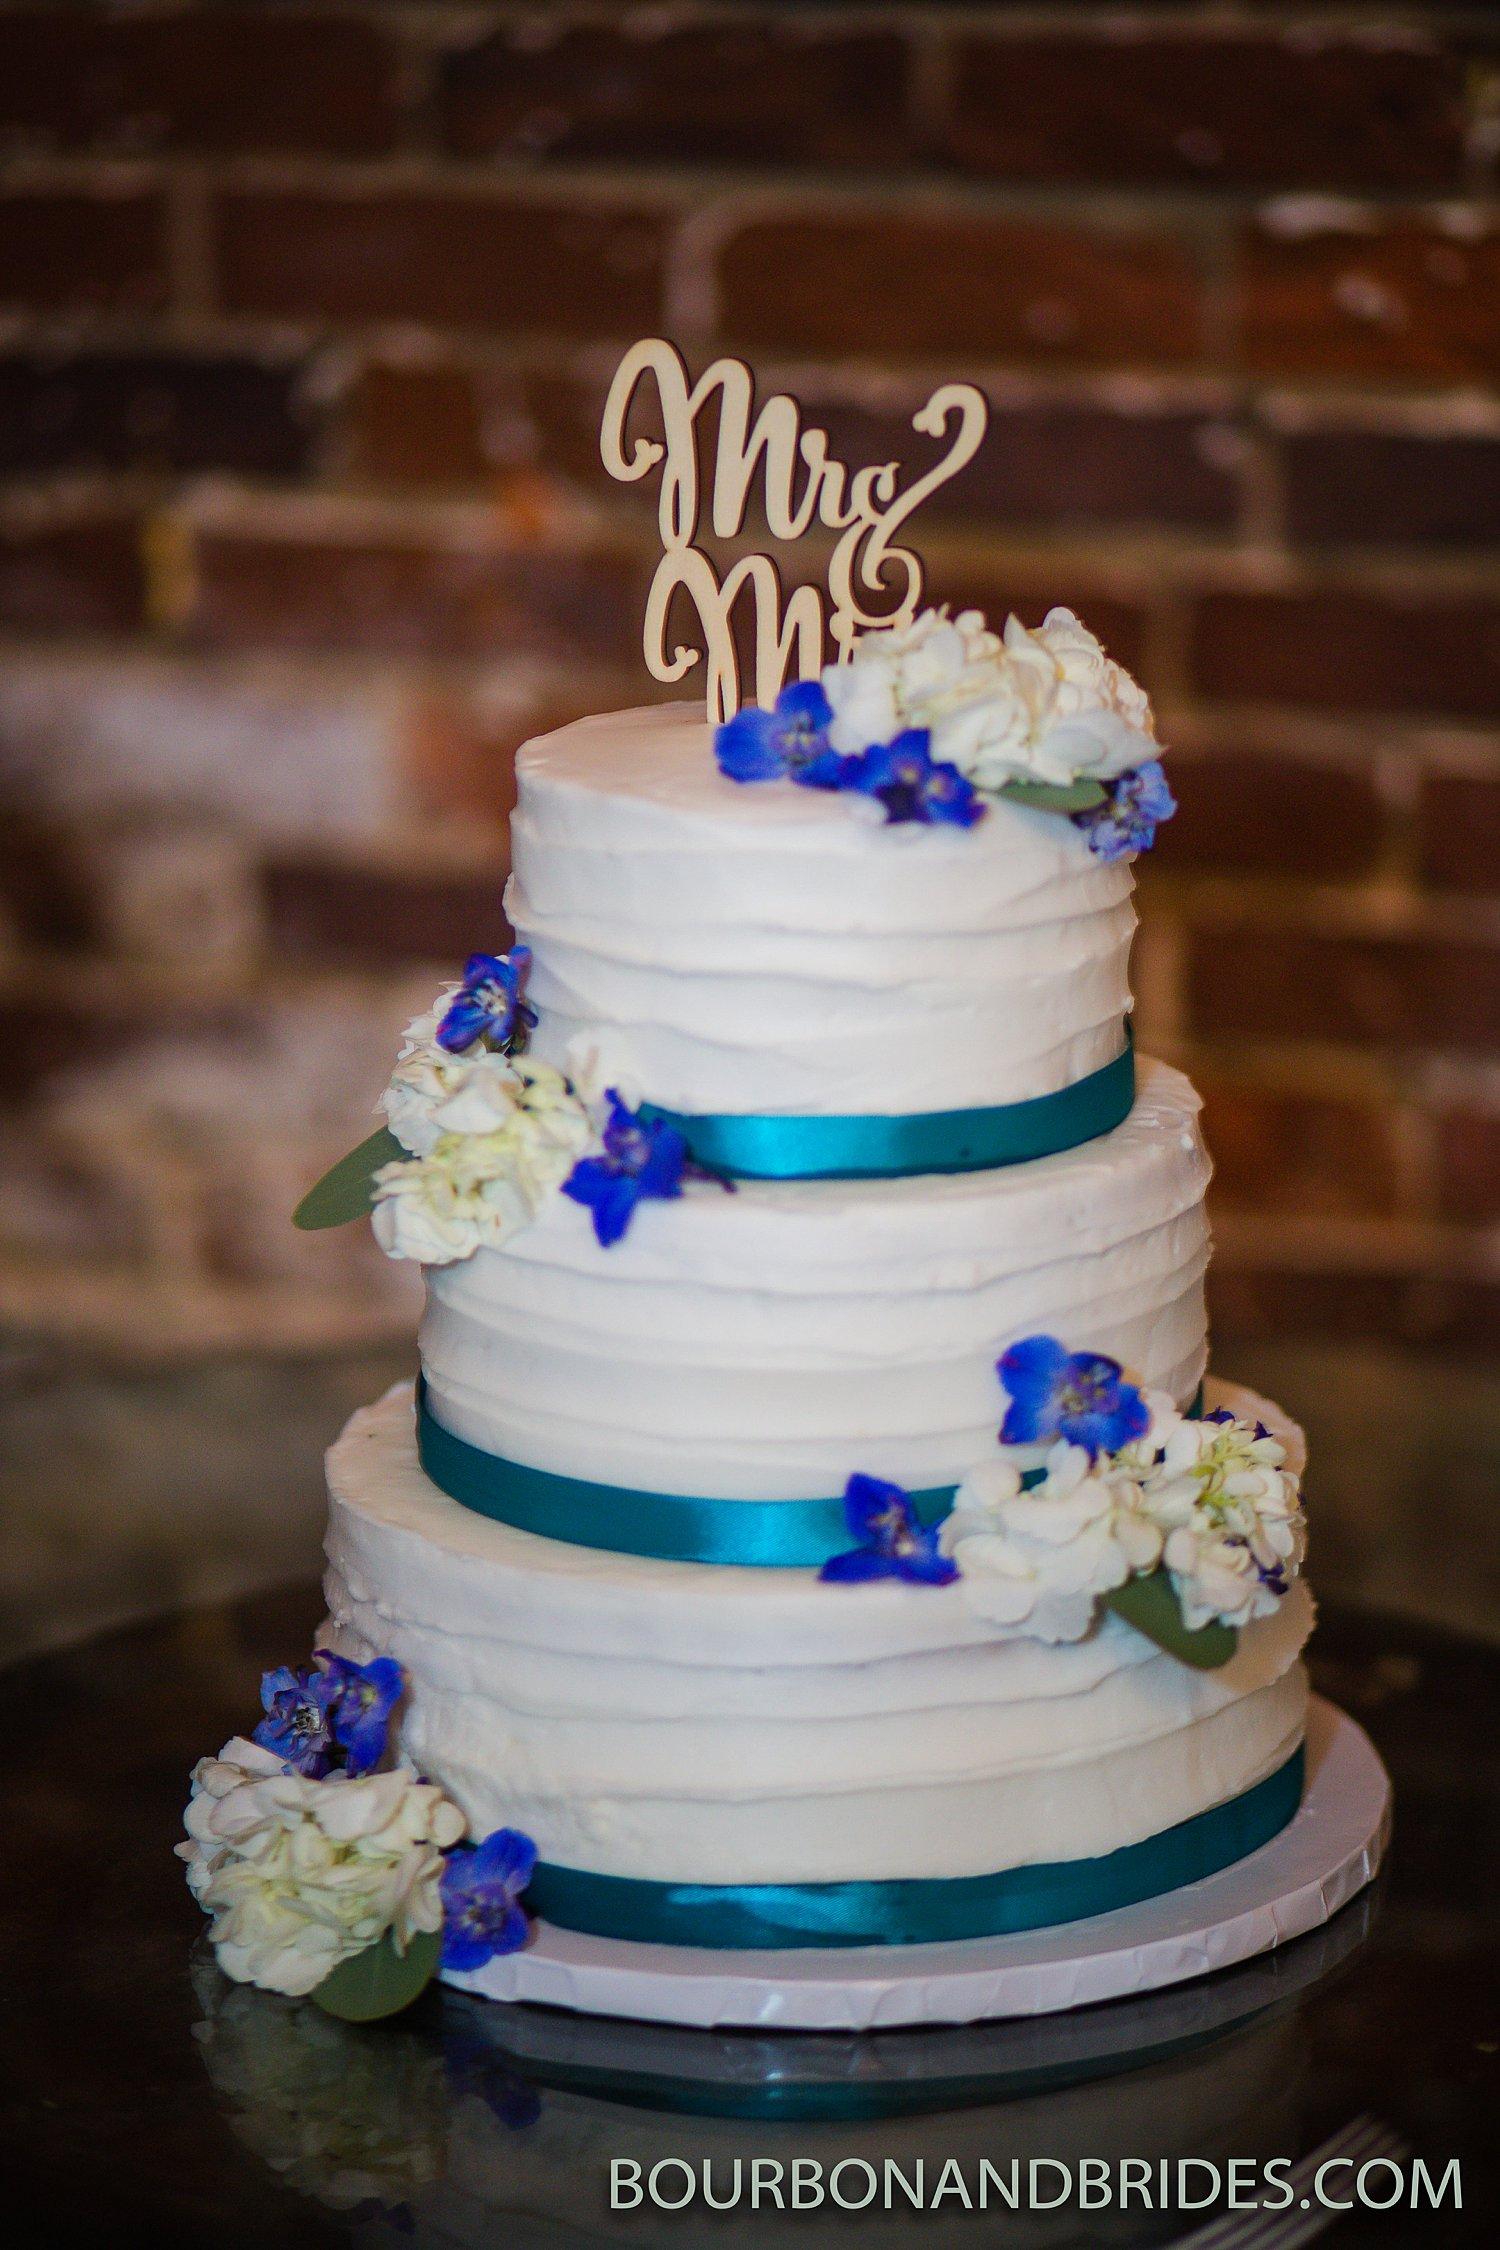 Lexington-Kentucky-wedding-the-cake-lady.jpg